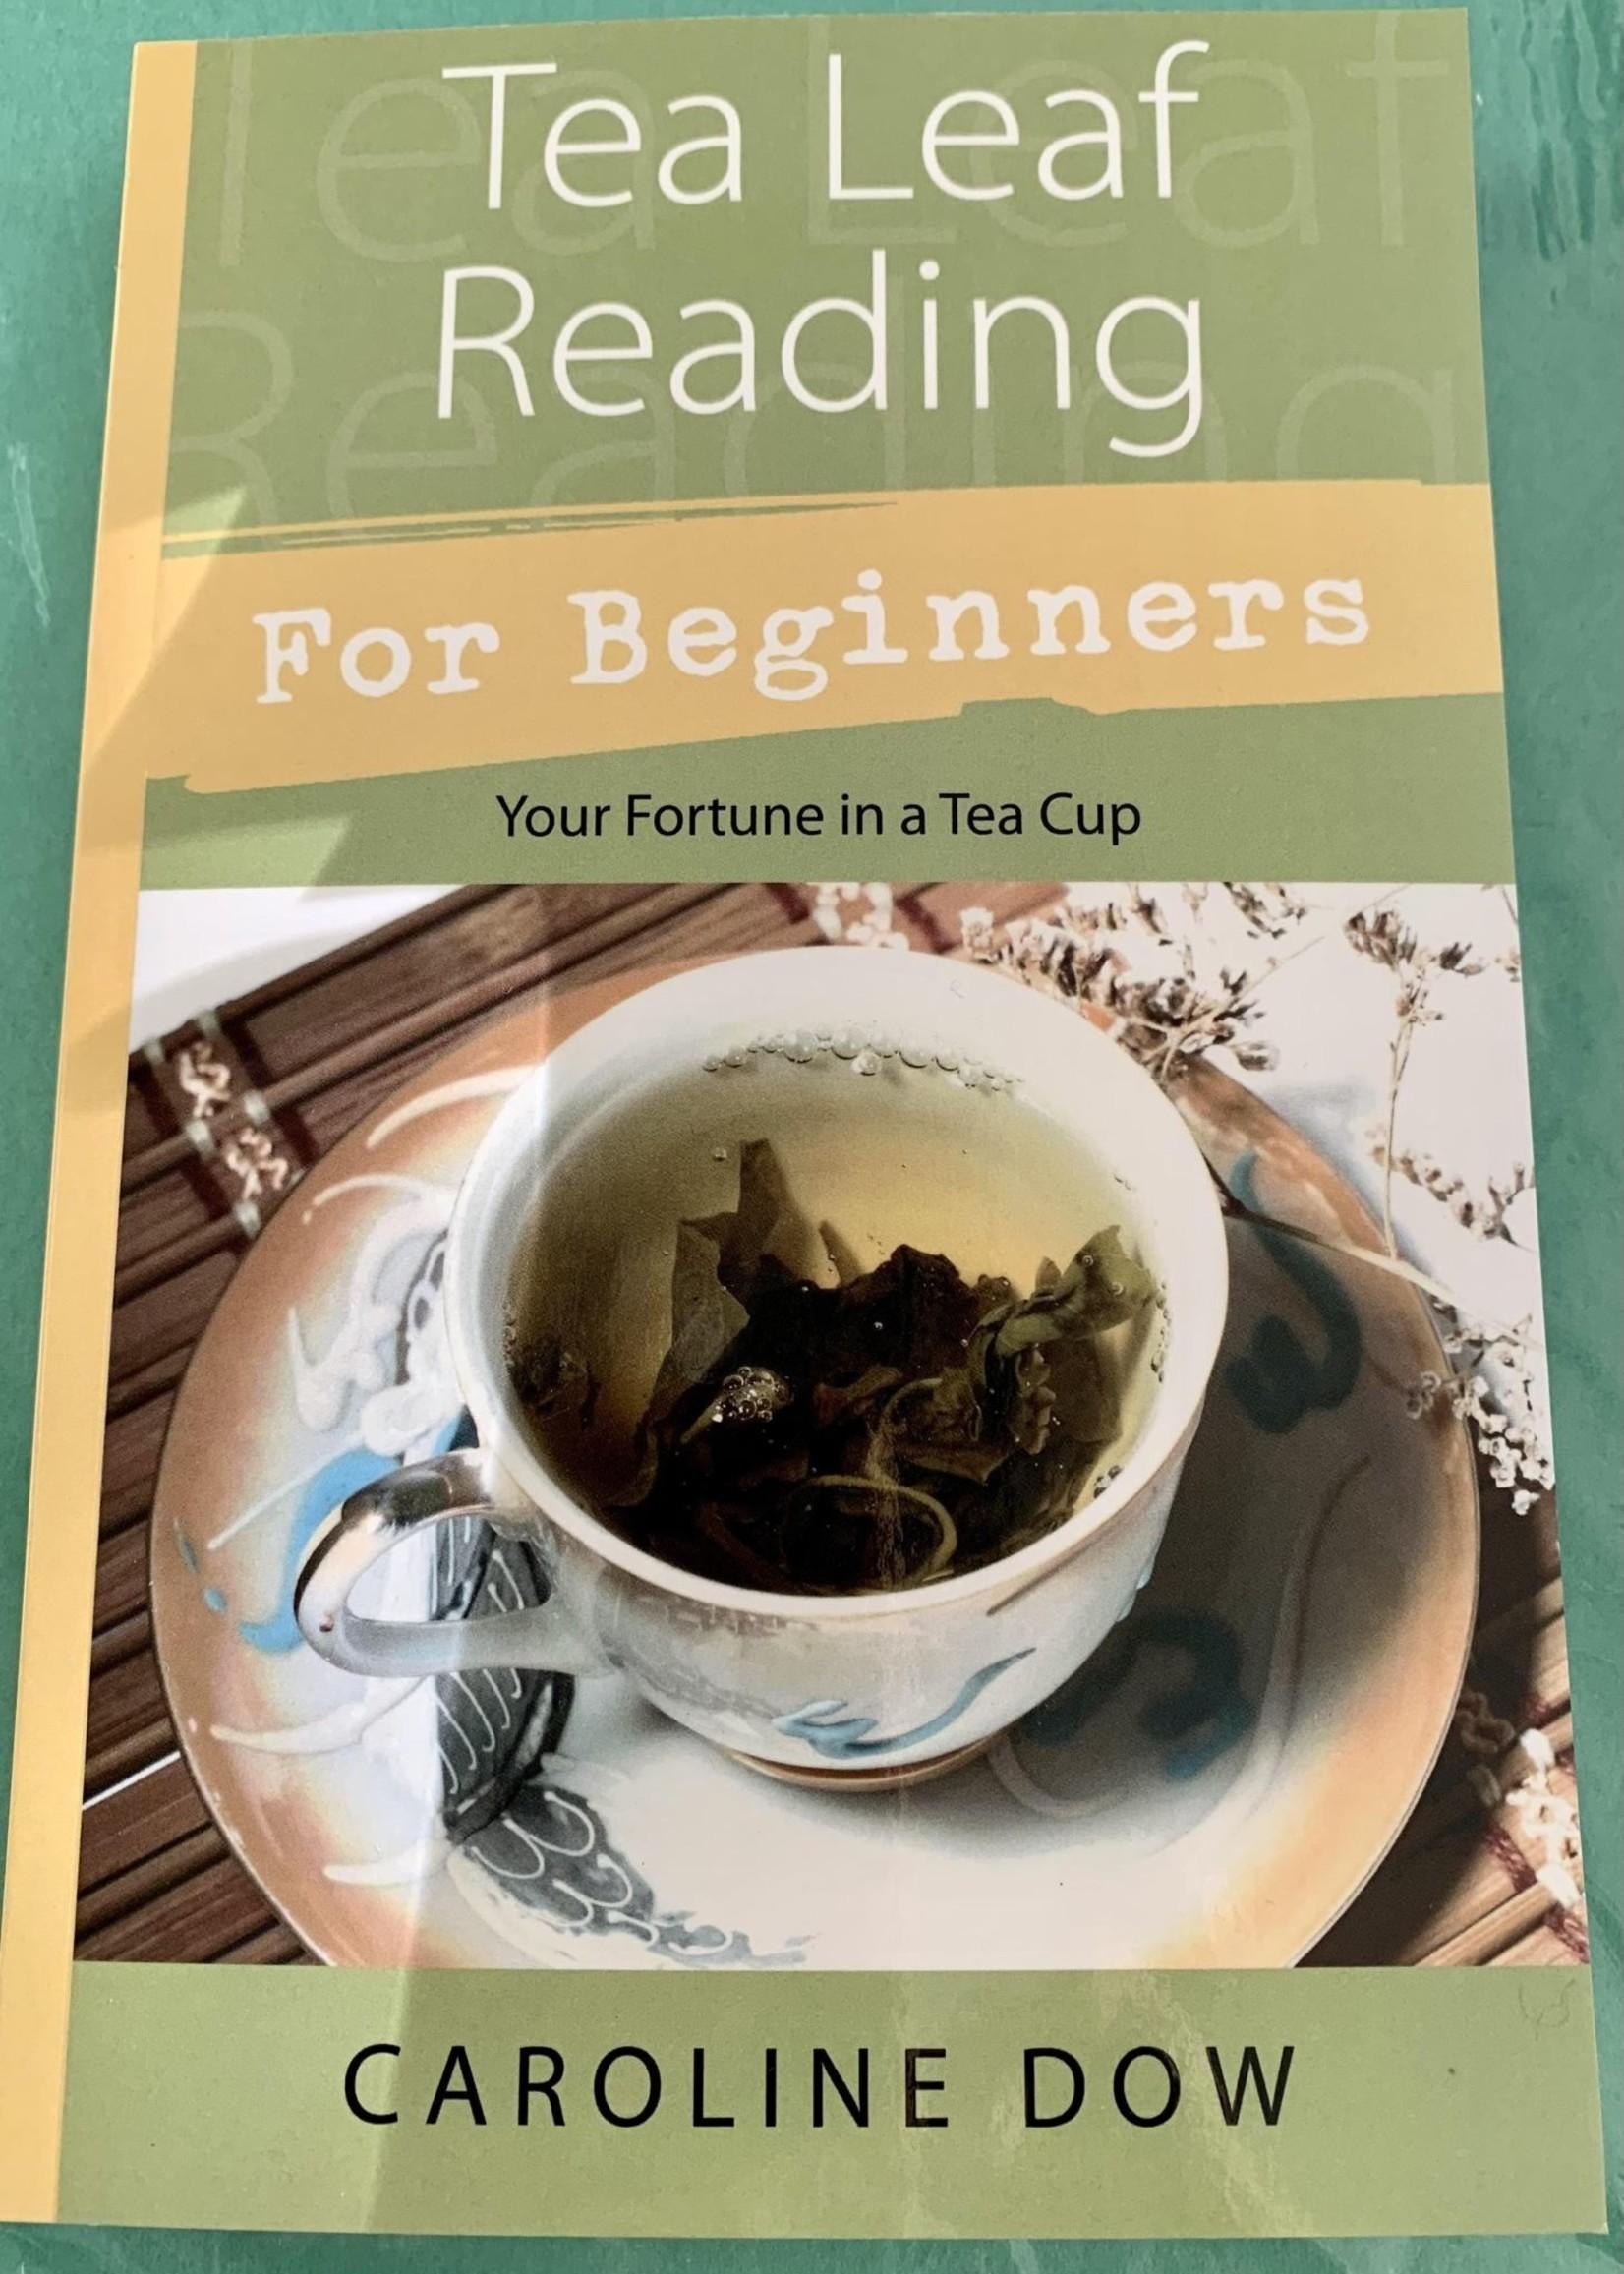 Tea Leaf Reading For Beginners -  BY CAROLINE DOW